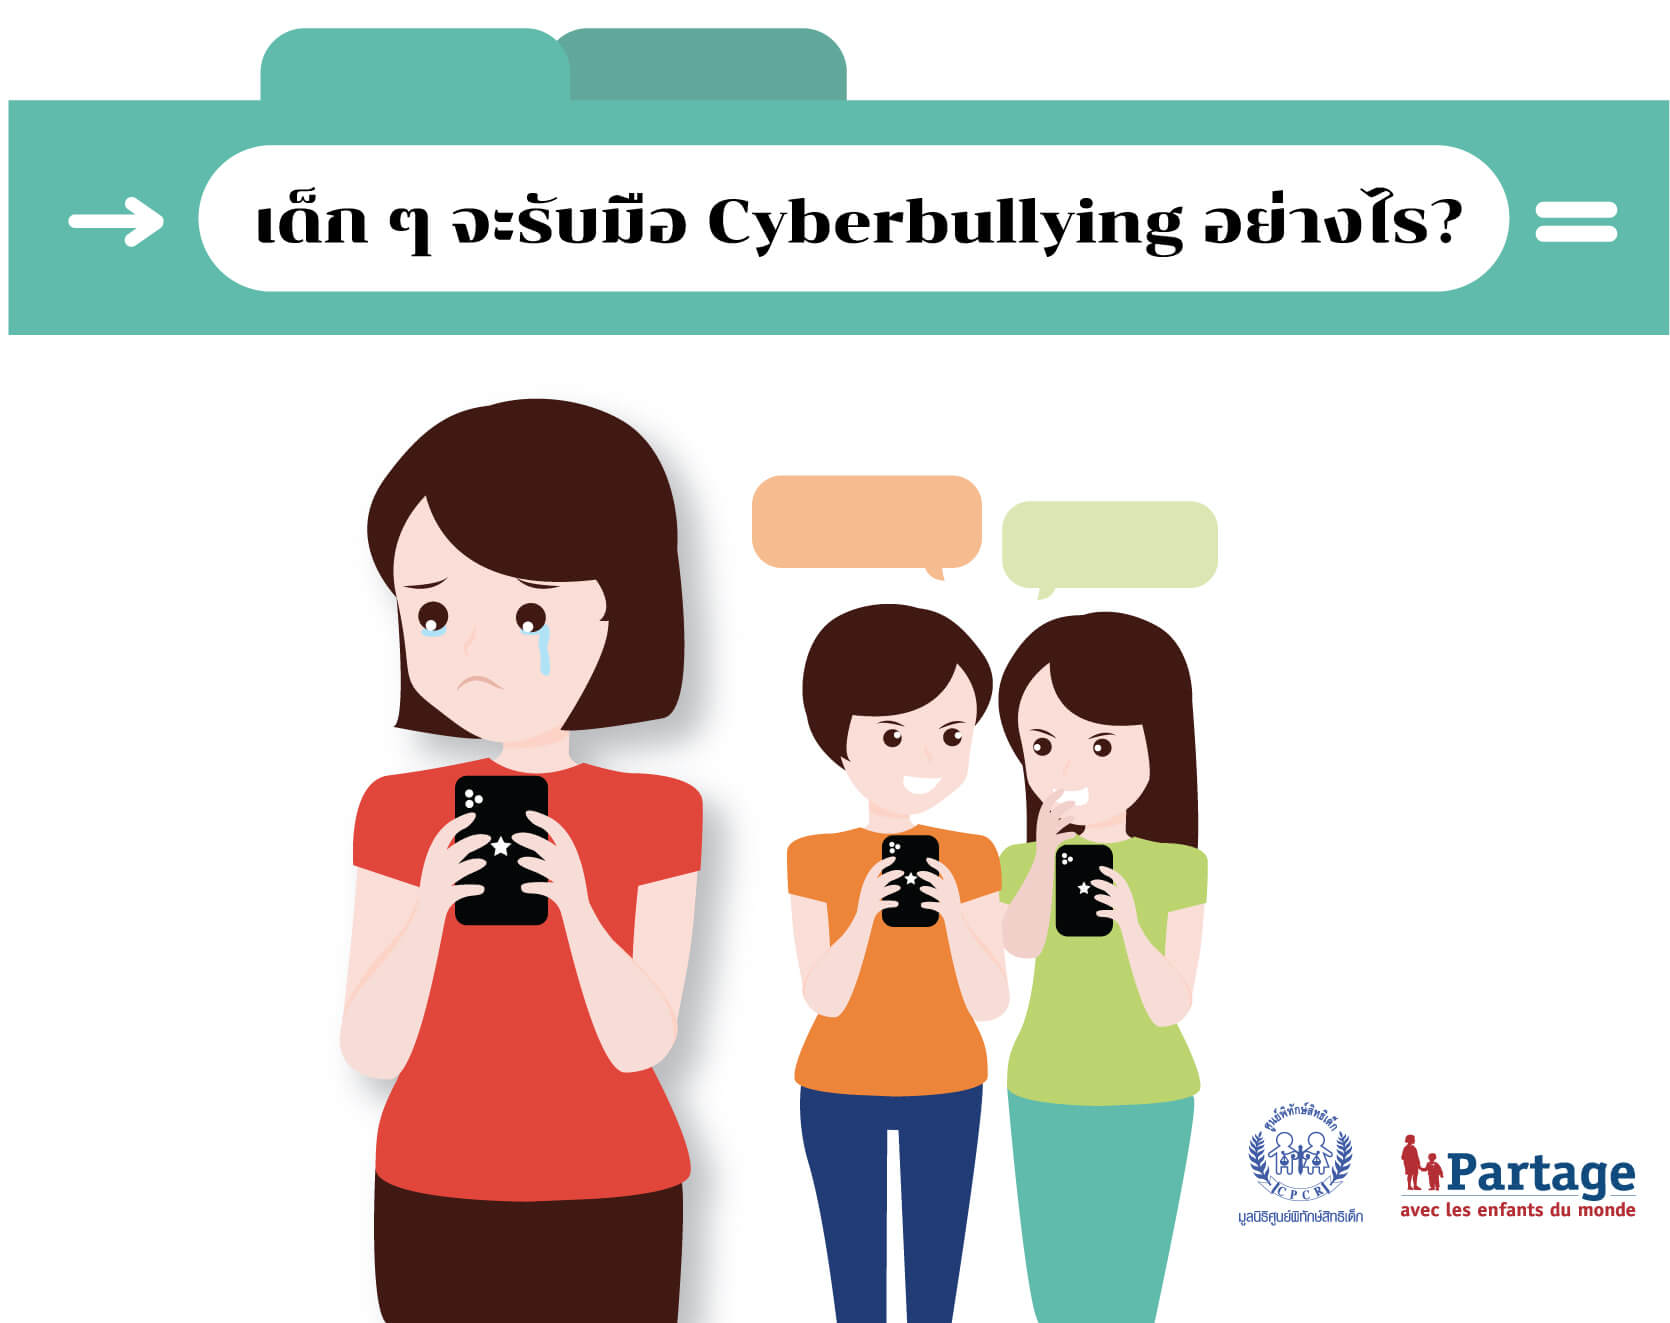 Infographic เด็ก ๆ จะรับมือ Cyberbullying อย่างไร?